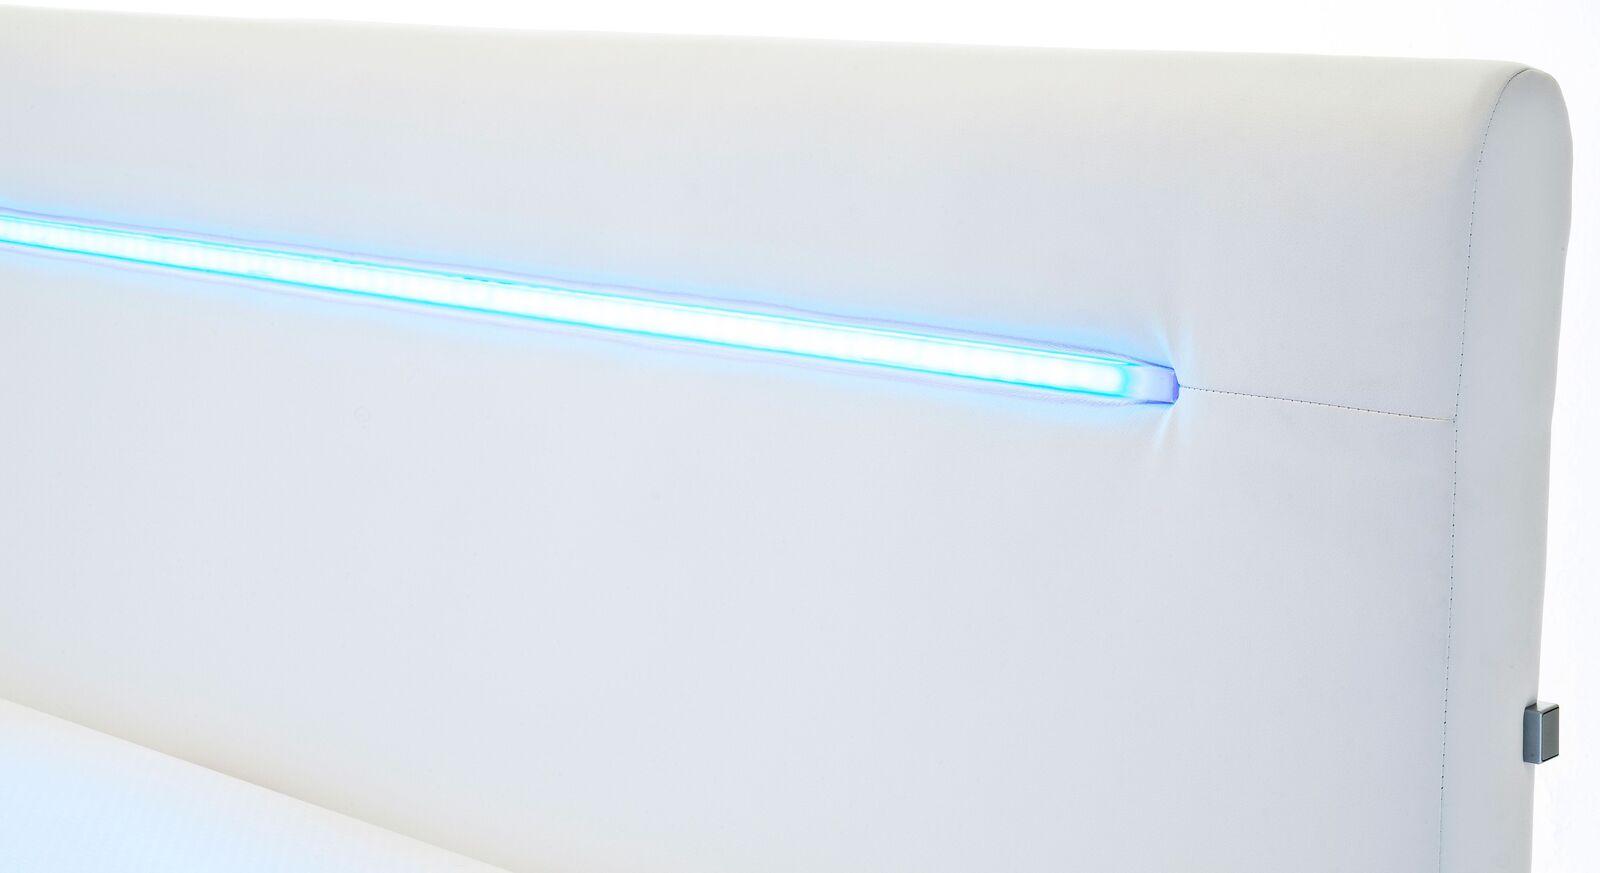 Boxspringbett Lexton mit gepolstertem Kopfteil inklusive LED-Stripes